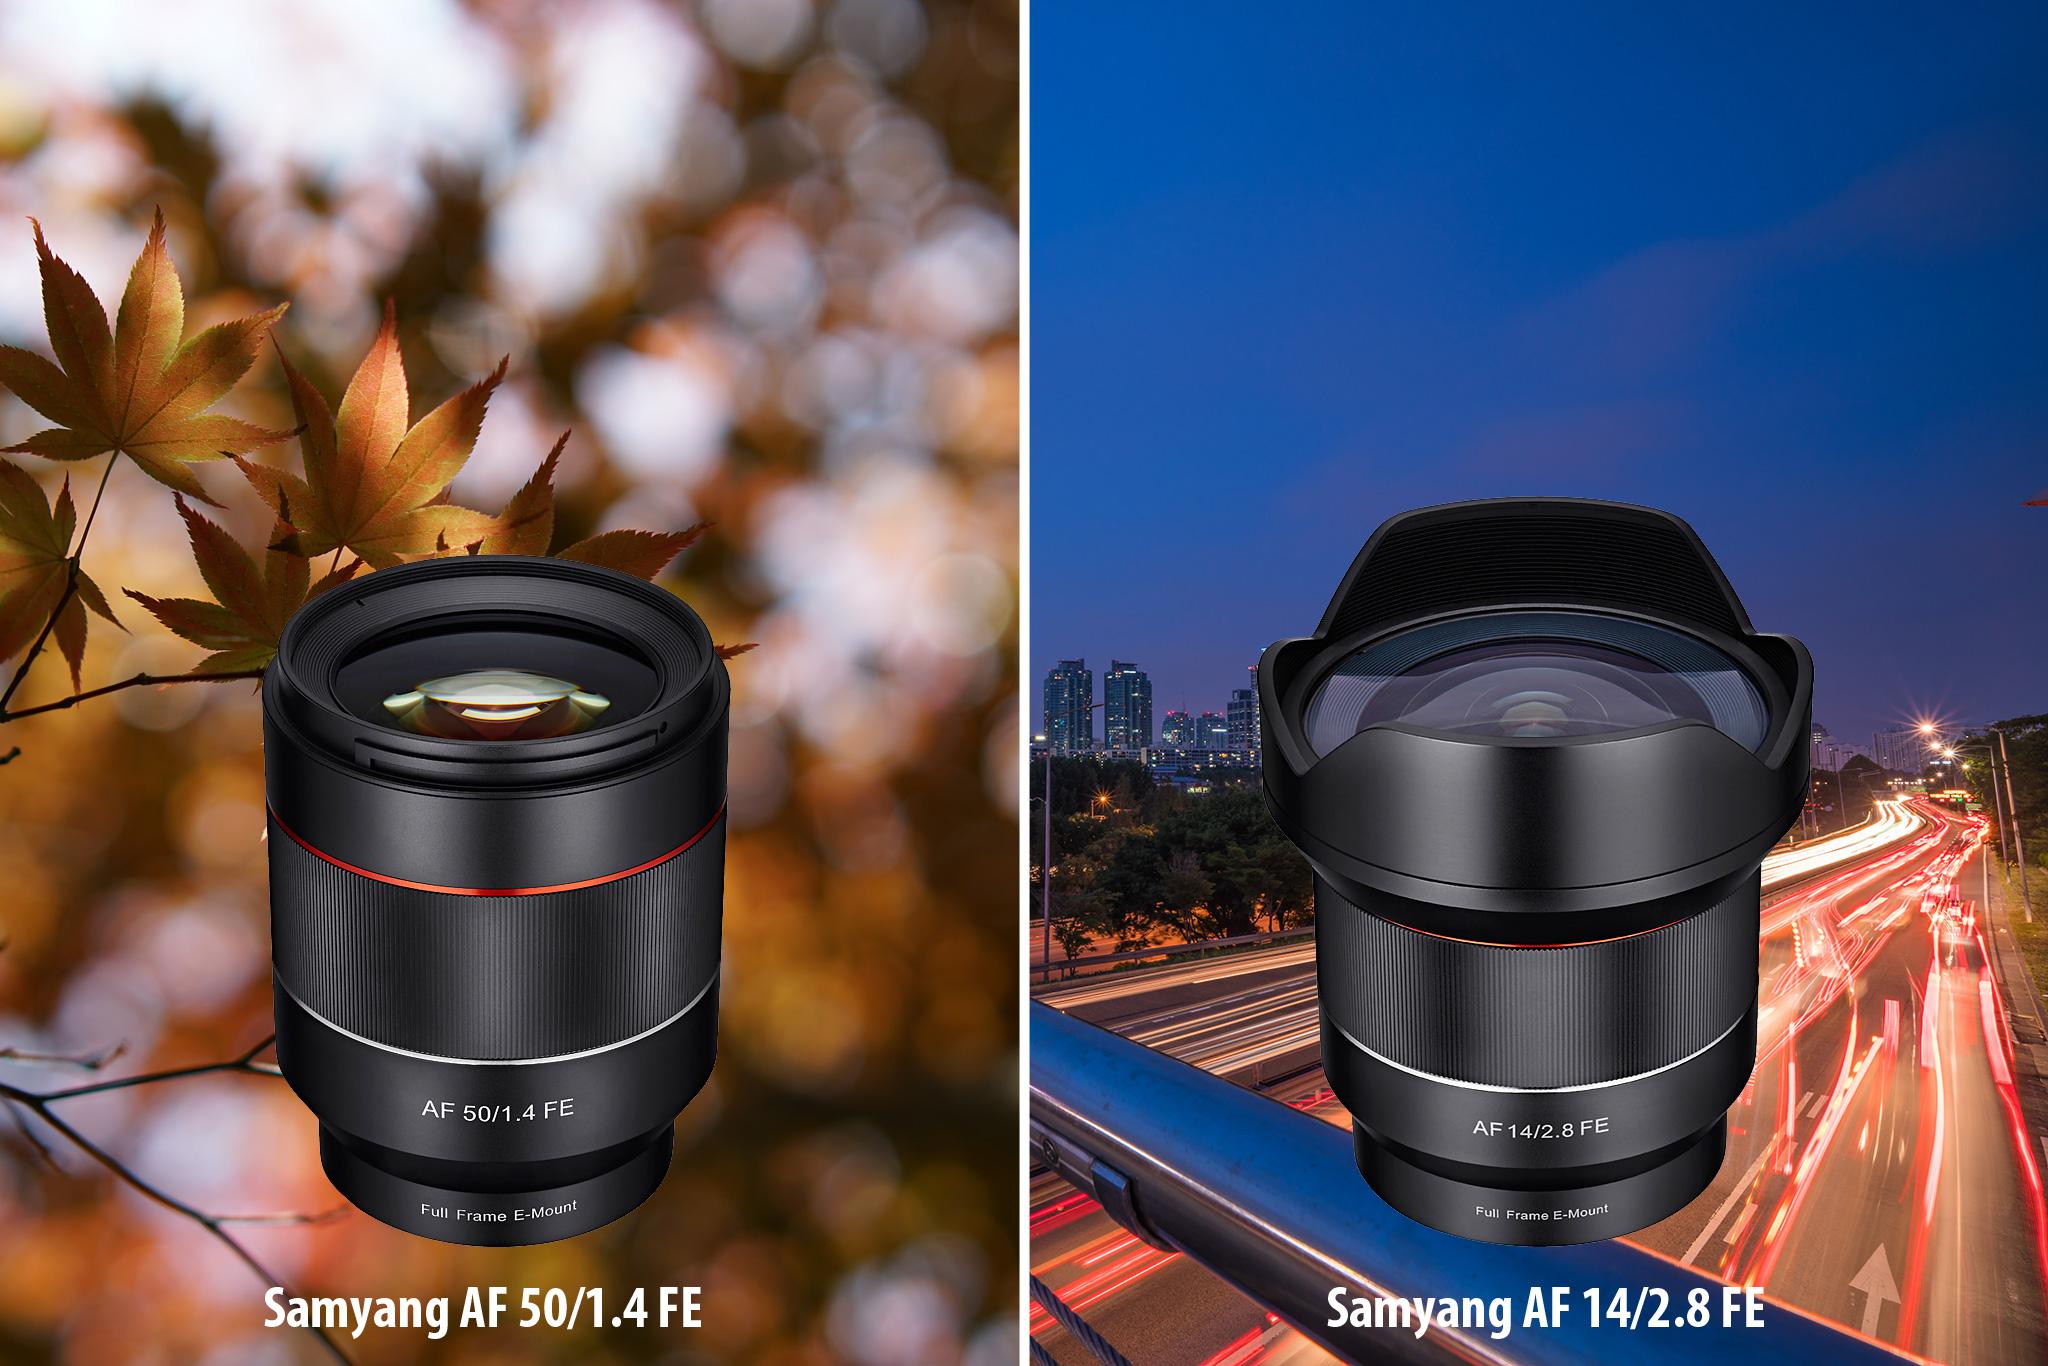 Samyang Autofokusobjektive - Hapa-Blog